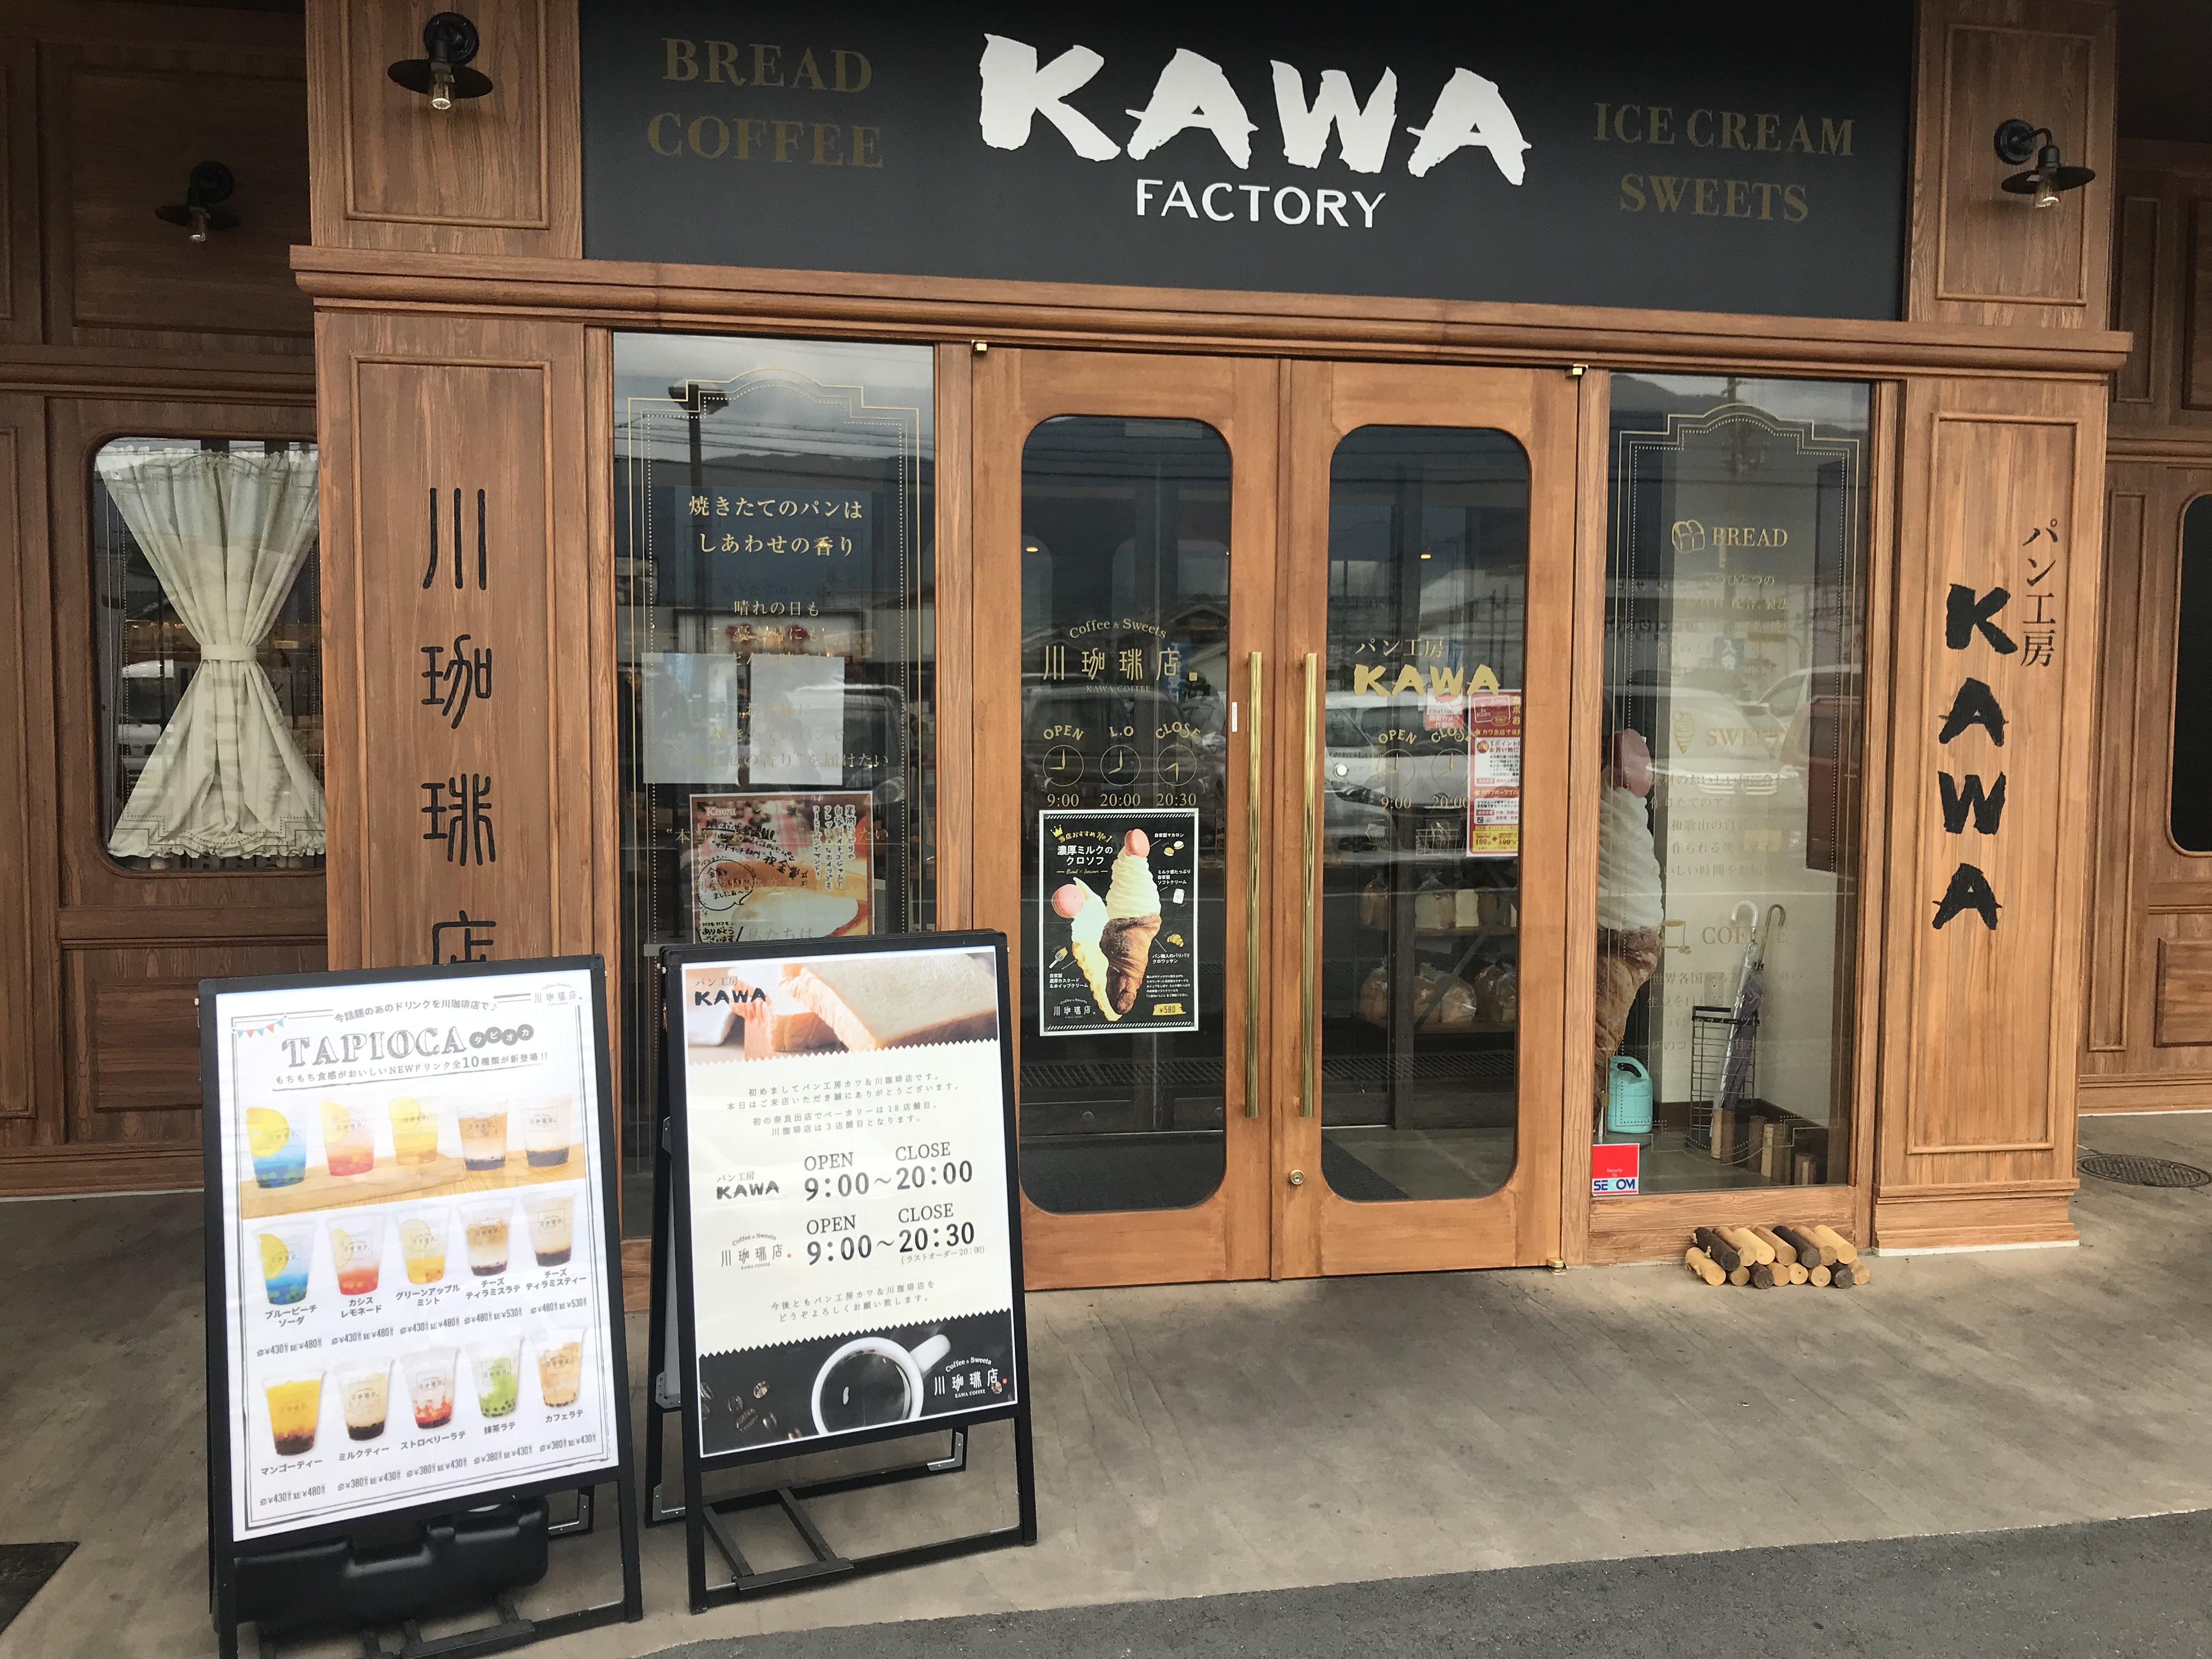 川珈琲店 (パン工房 KAWA)